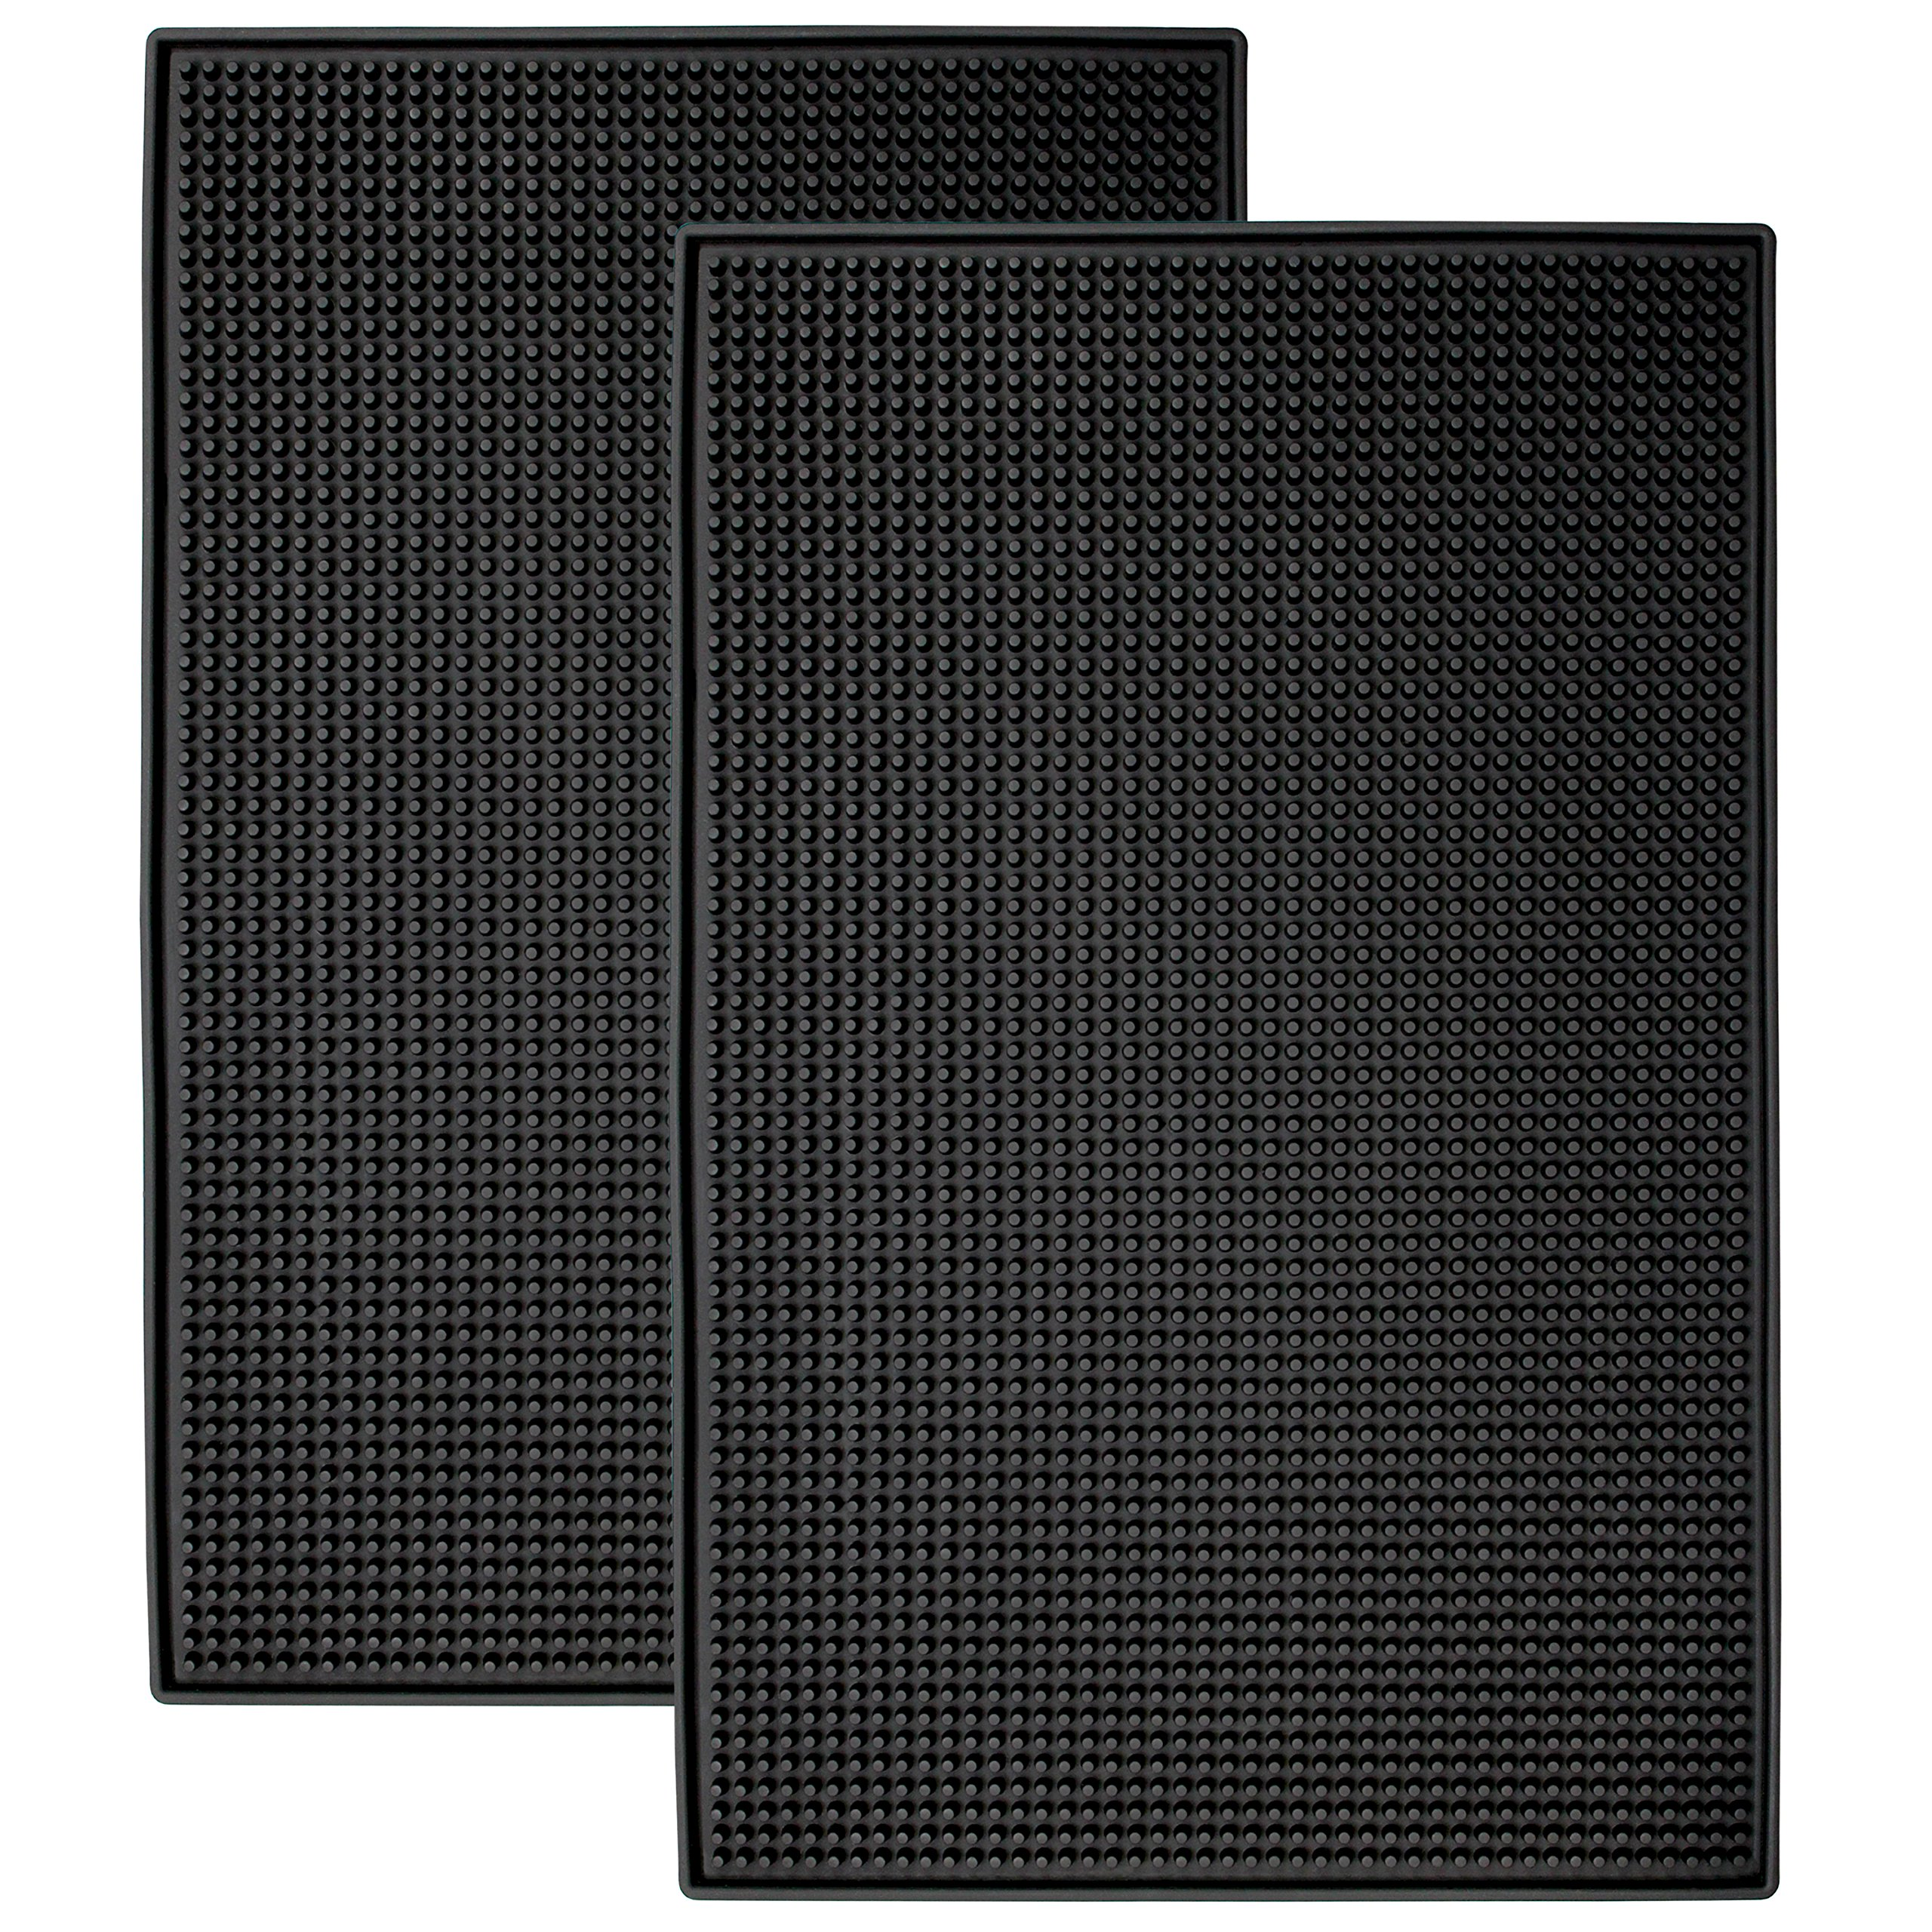 Schroeder & Tremayne, Inc. 428001 Heavy Duty Rubber Bar Service Mat, Rubber Black, 2 Pack